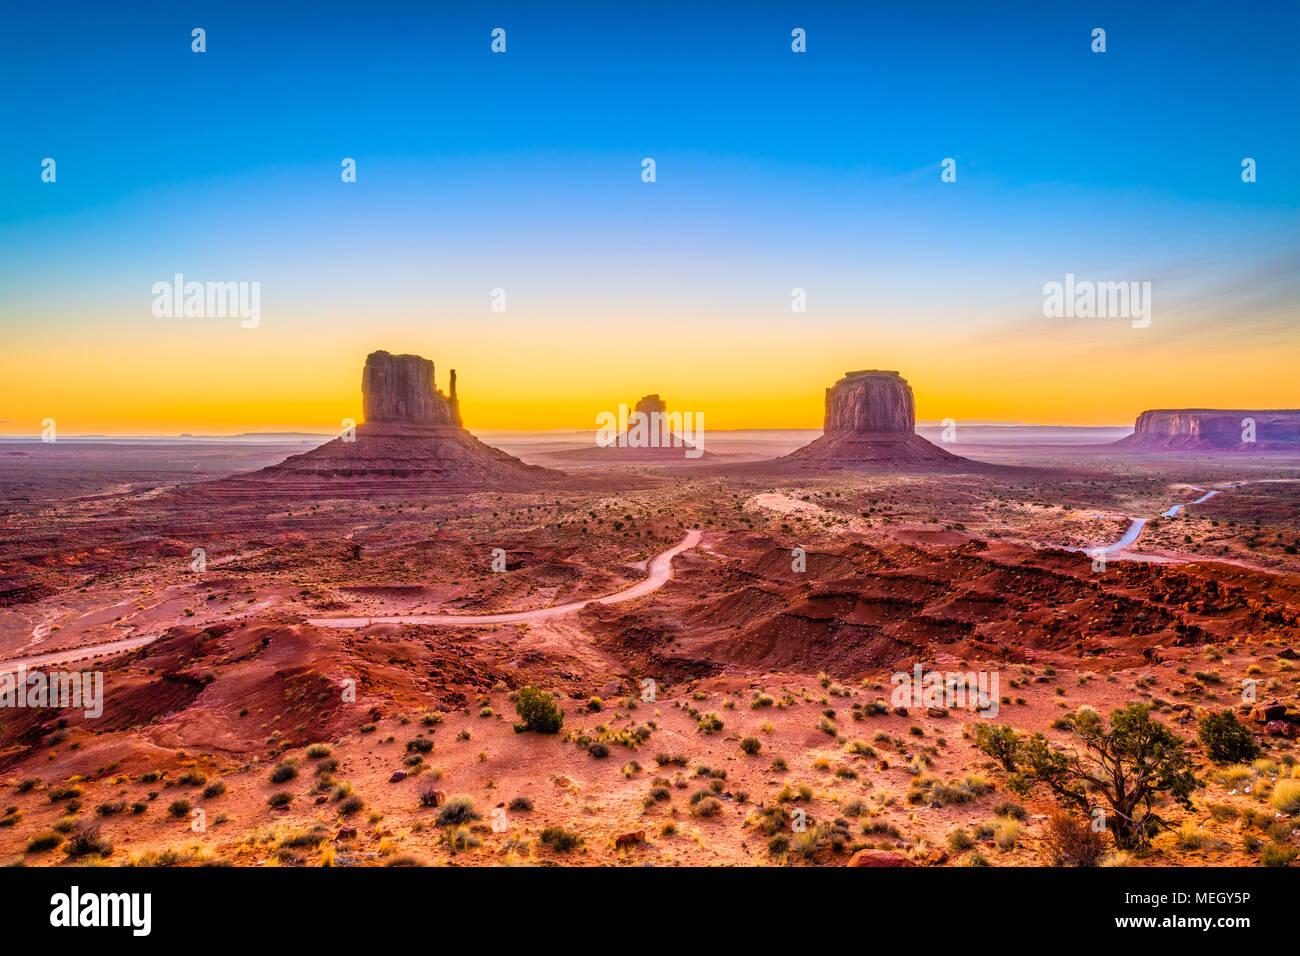 Monument Valley, Arizona, USA, à l'aube. Photo Stock